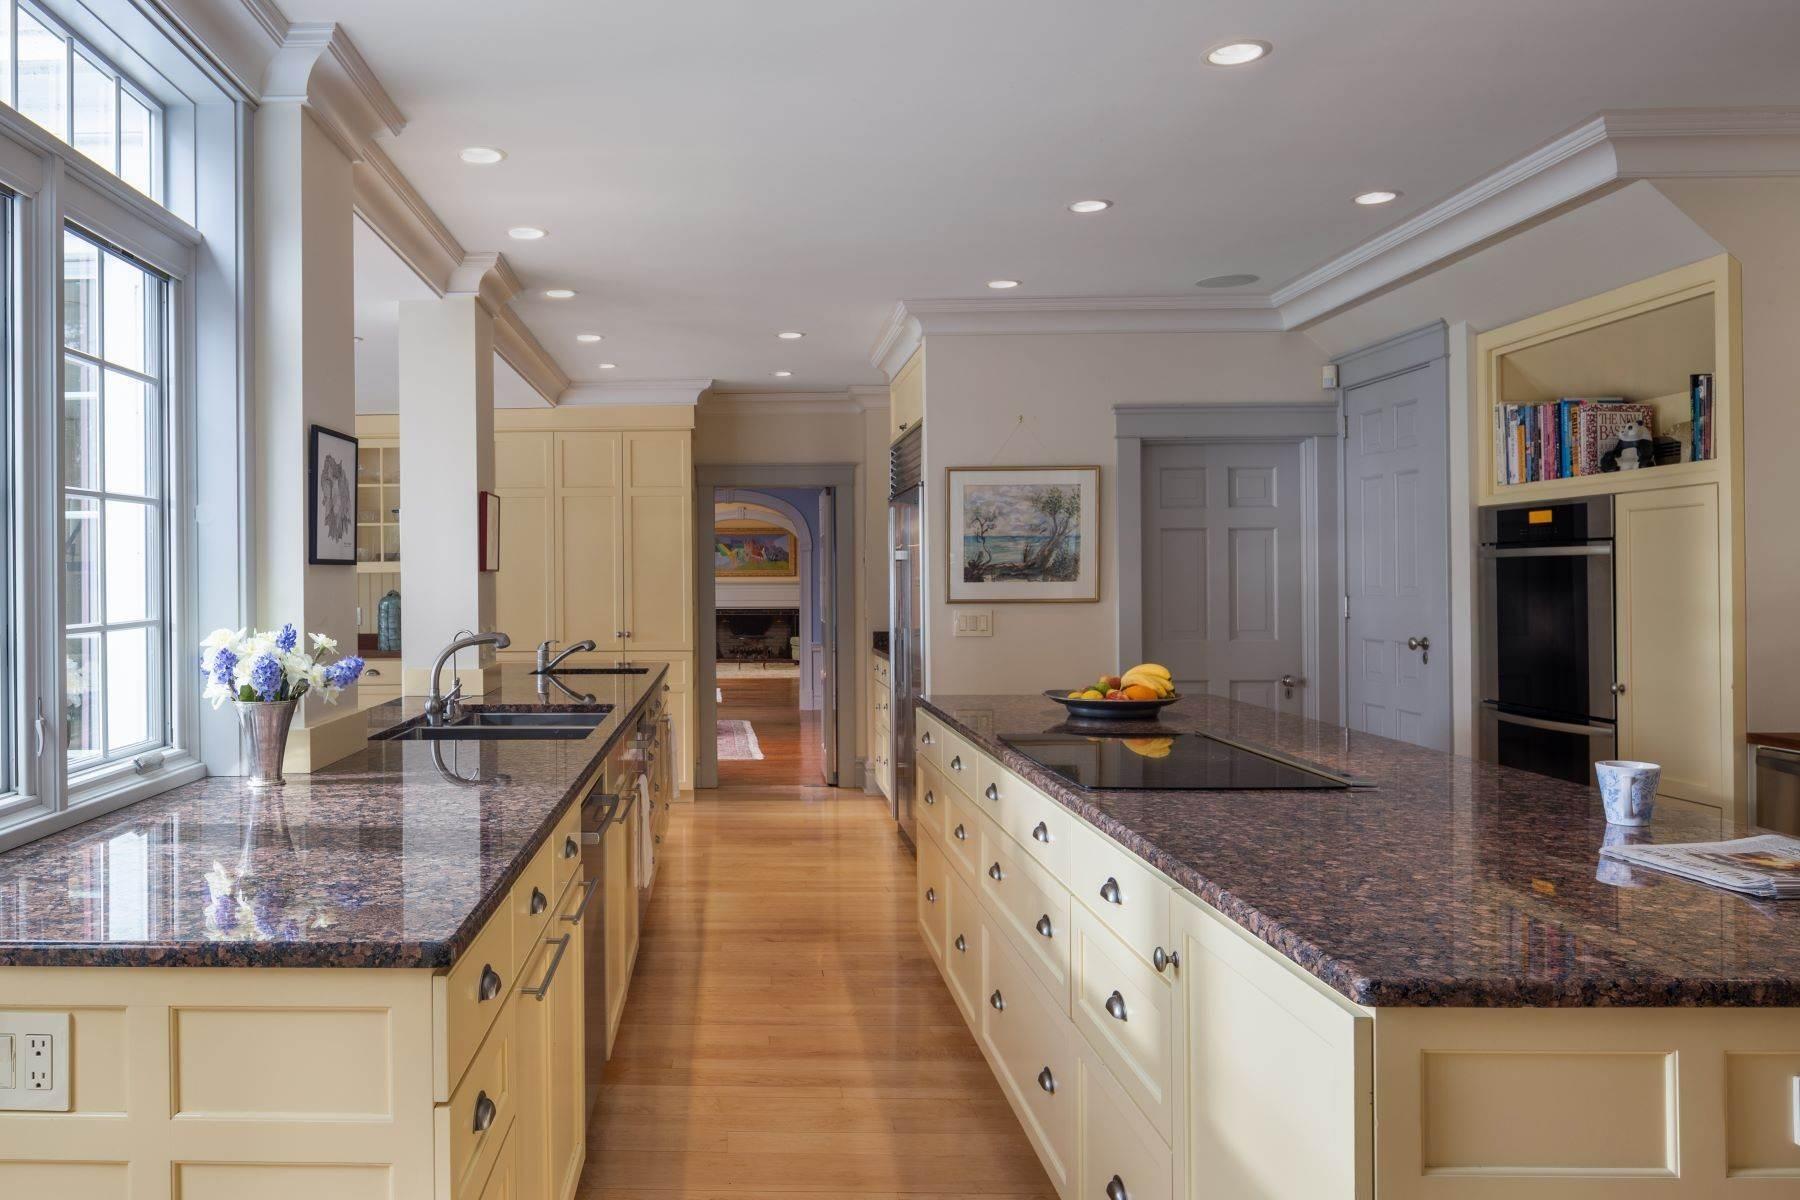 7. Single Family Homes for Sale at 260 Eshelman Road Lancaster, Pennsylvania 17601 United States